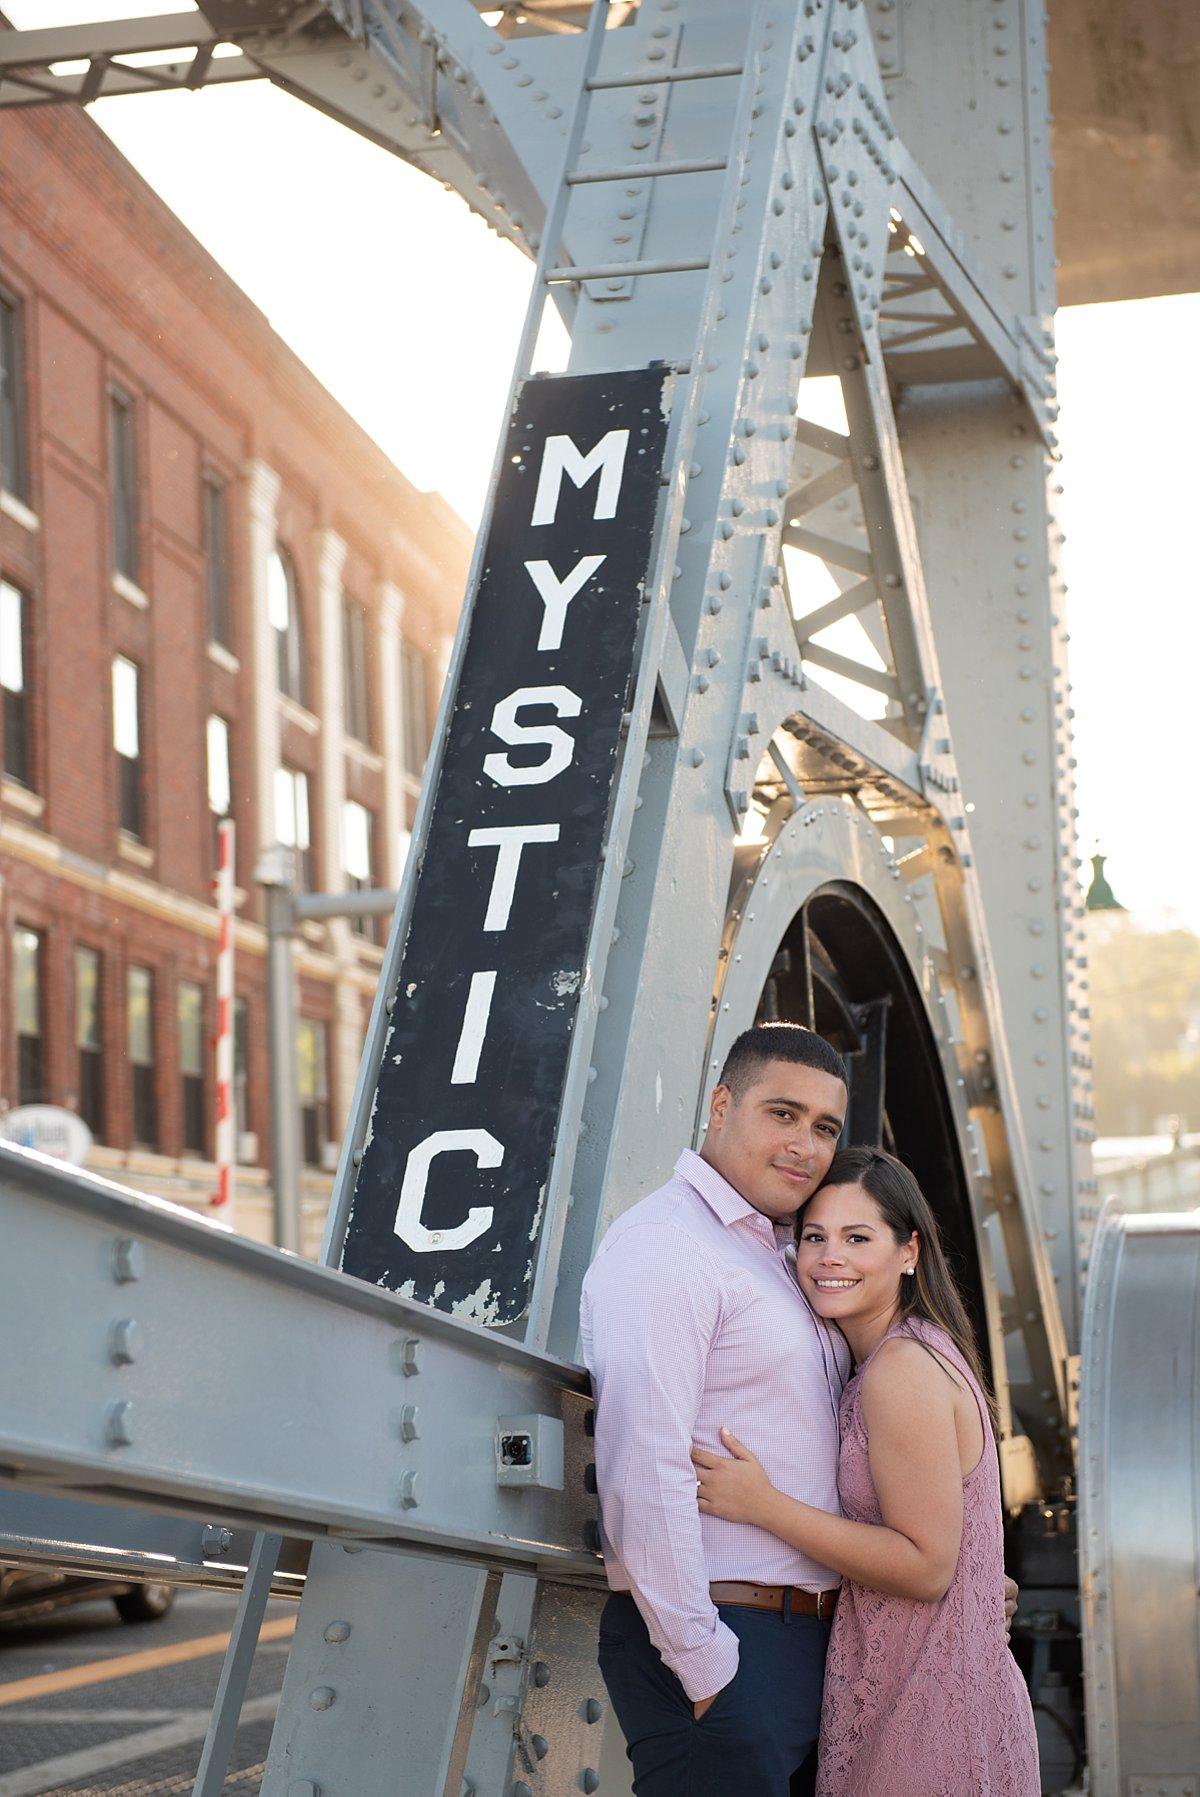 Downtown Mystic draw bridge